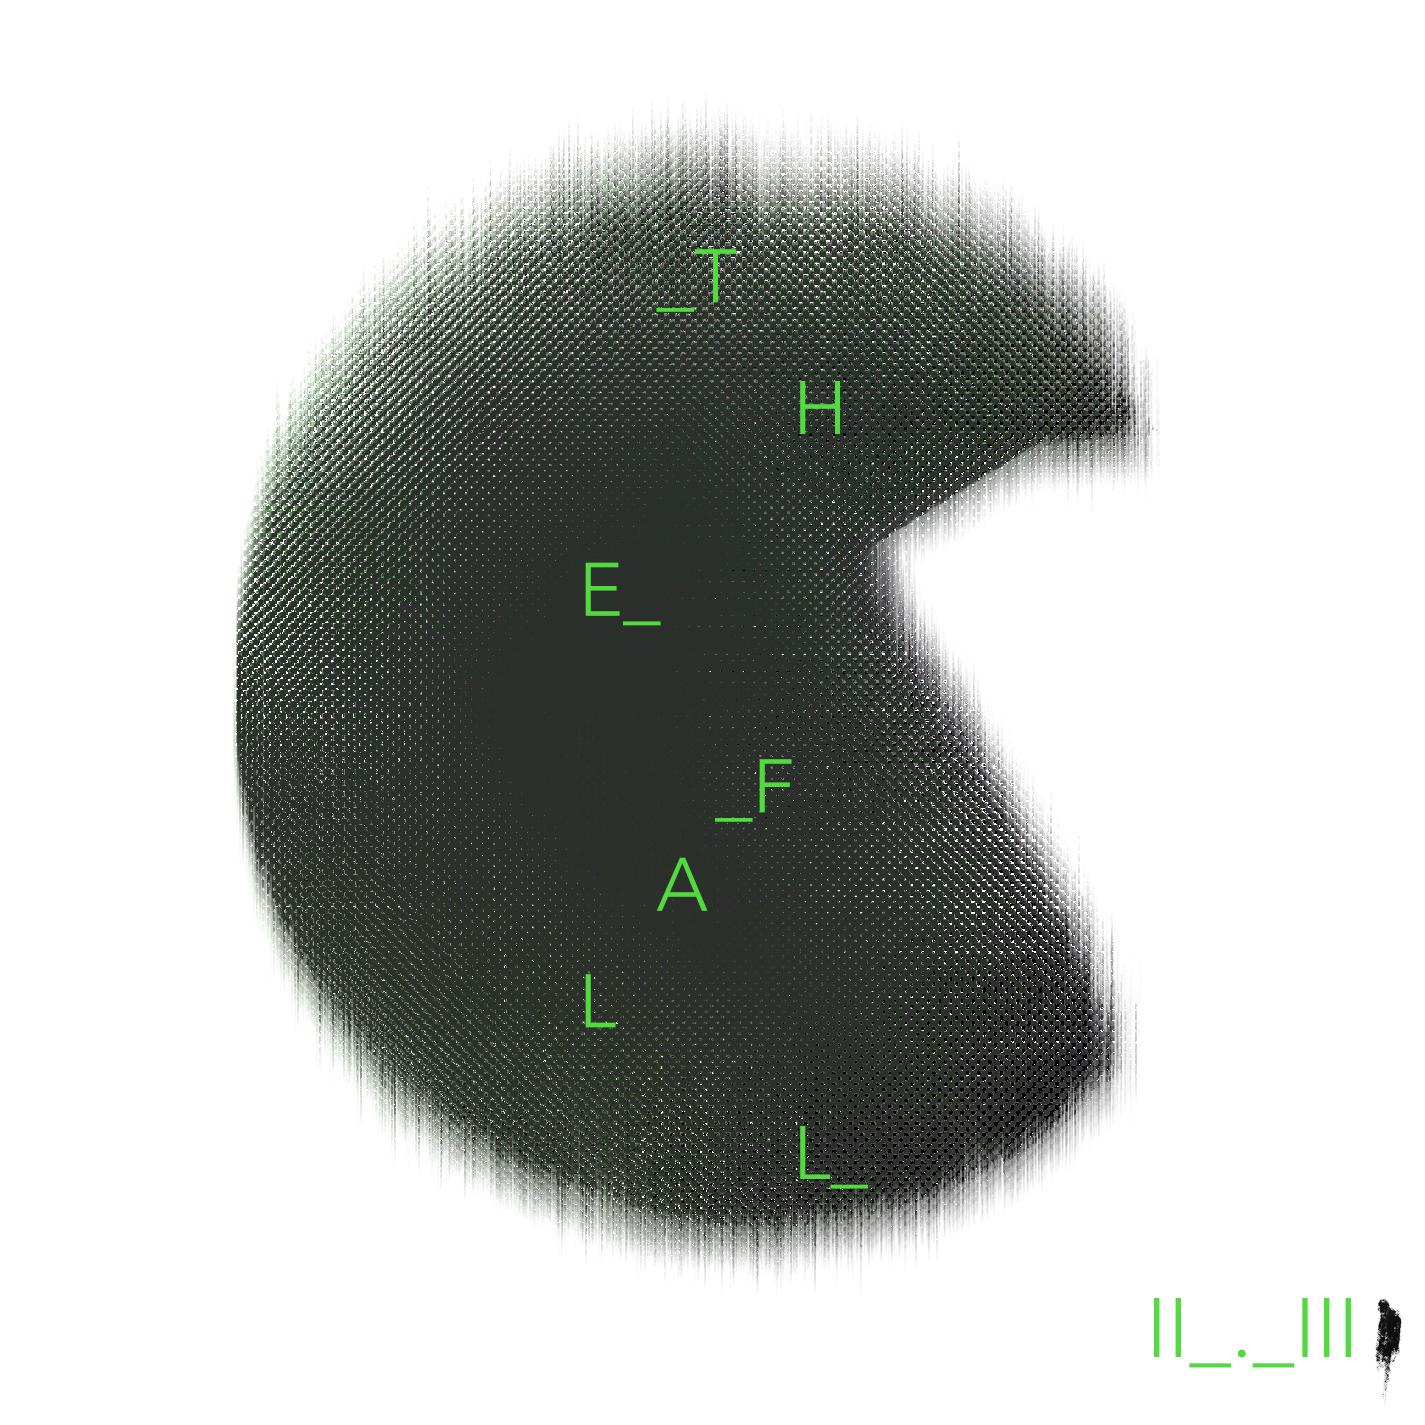 20160219 IFD THE FALL [No Logo].jpg